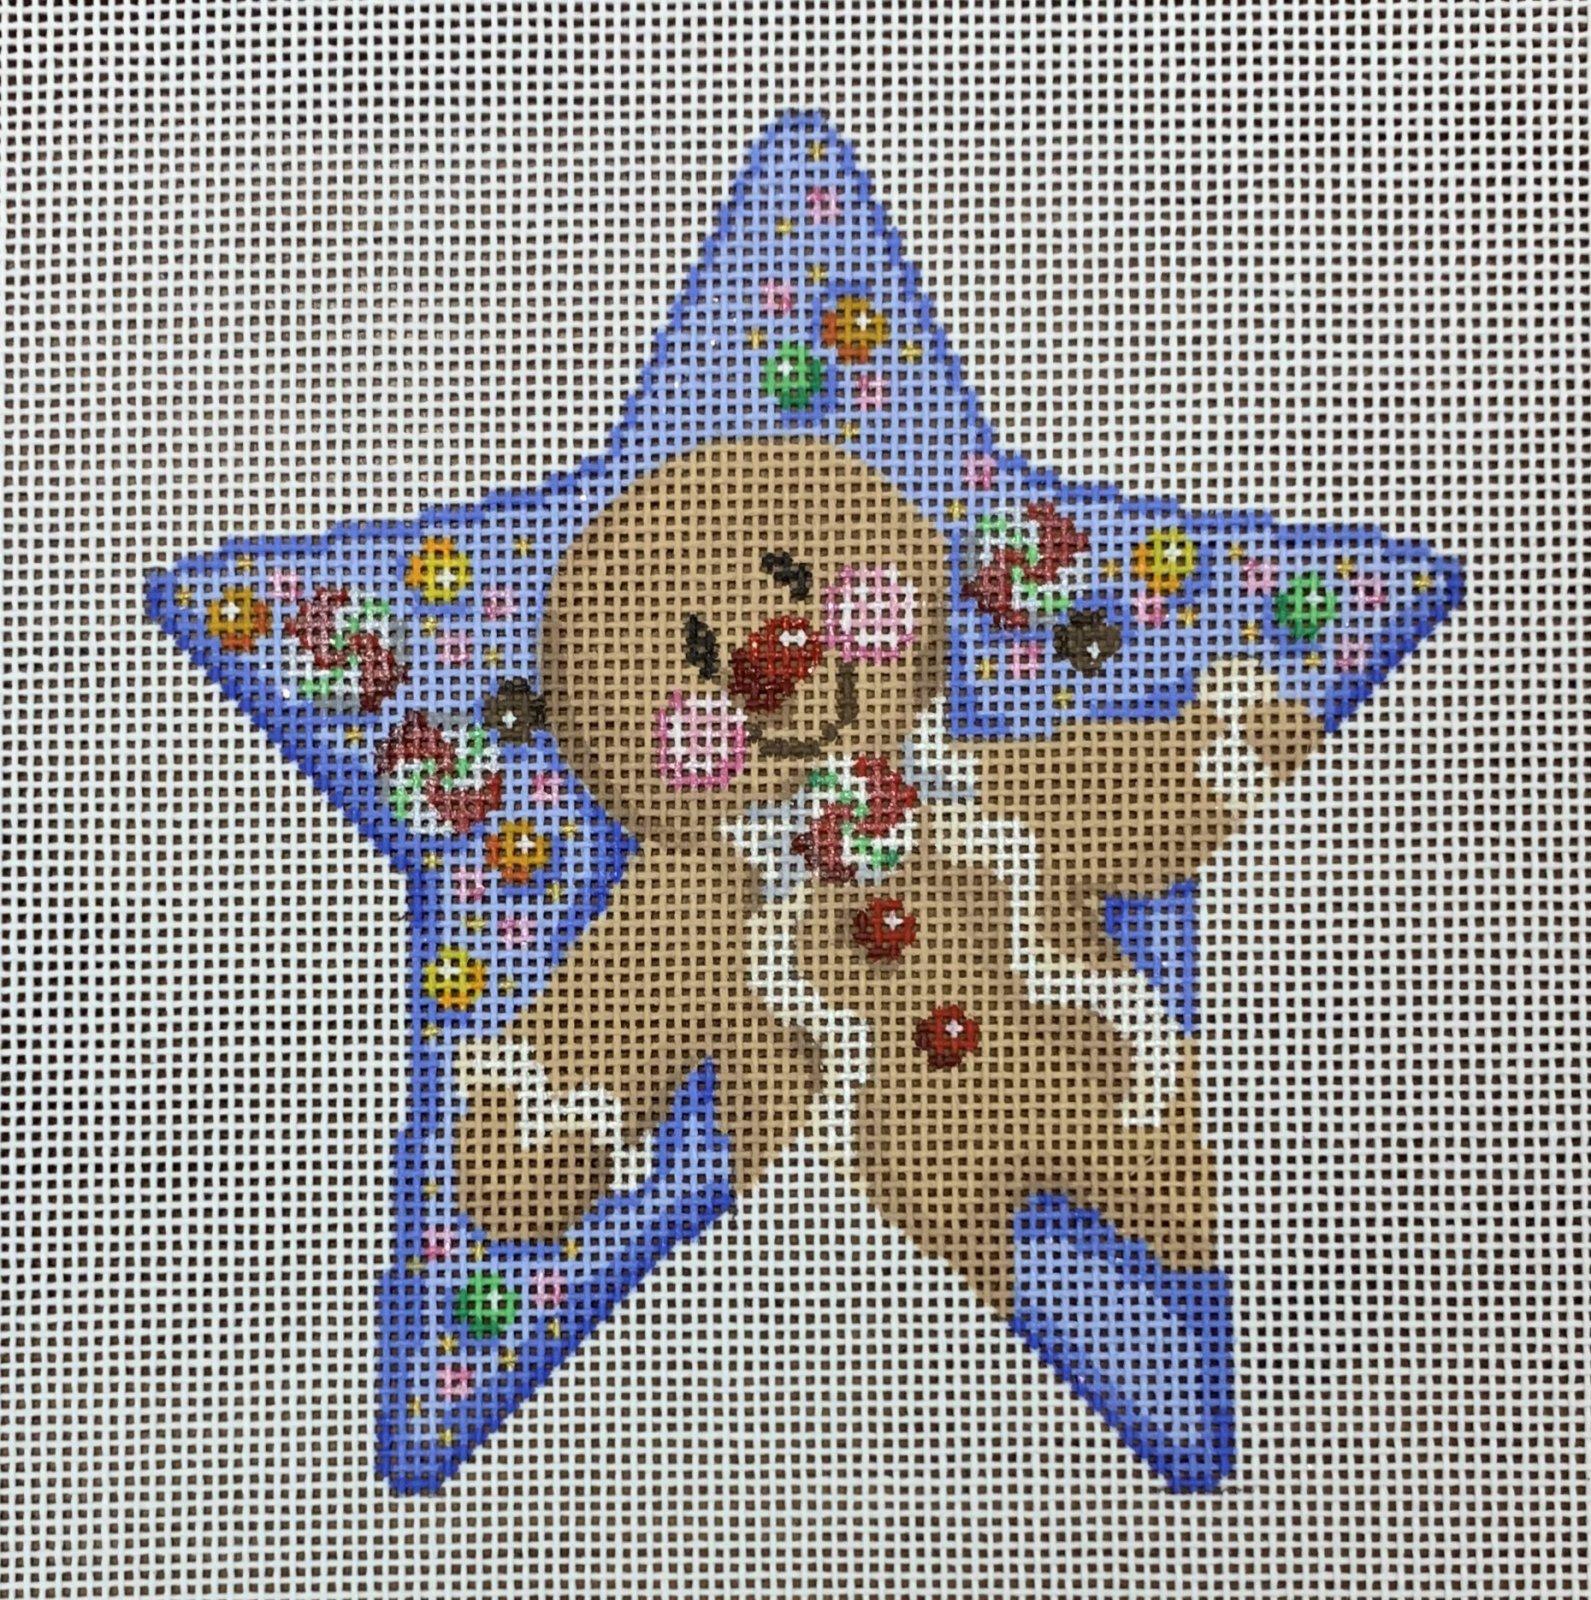 ATTSCT1706 Gingerbread Boy Star  4.75x5  18